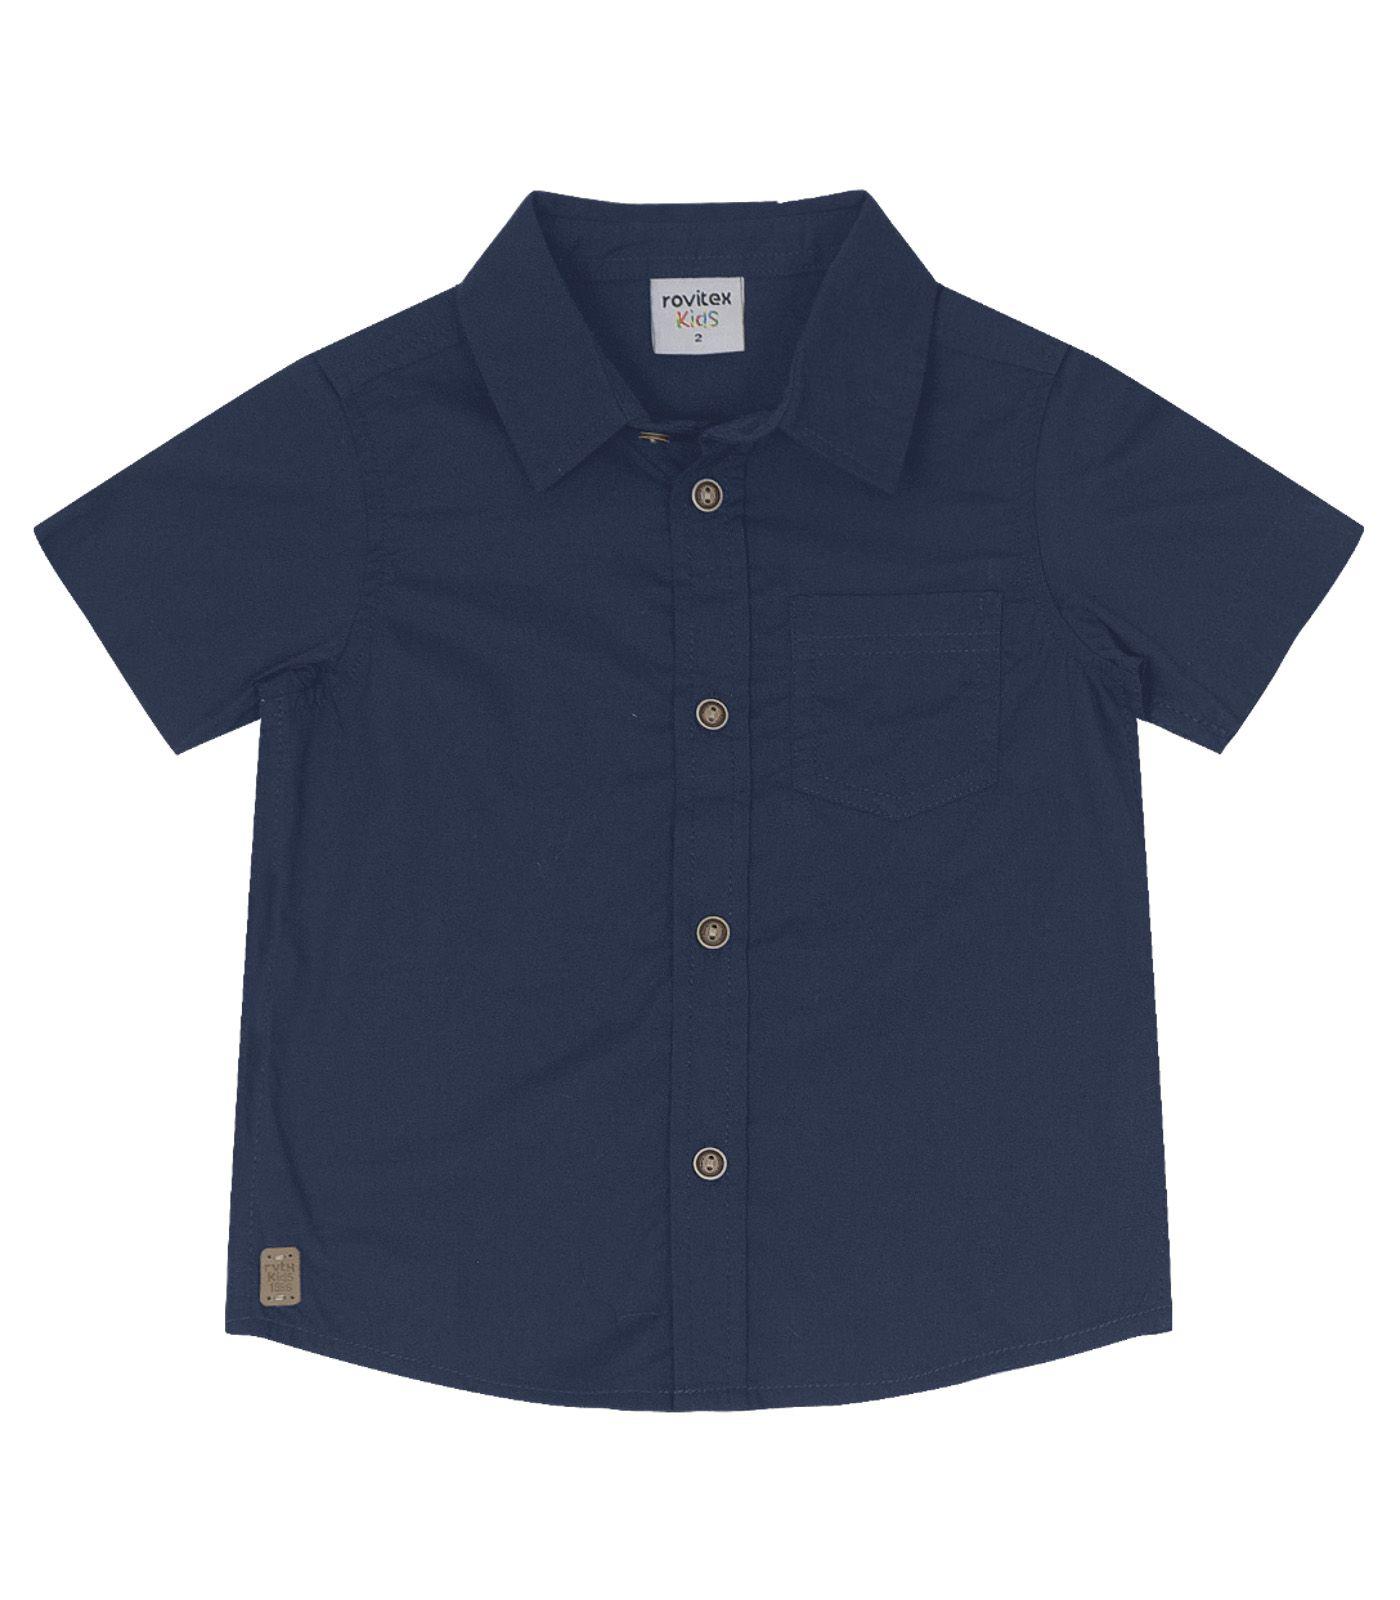 Camisa de Tricoline - Rovitex Kids